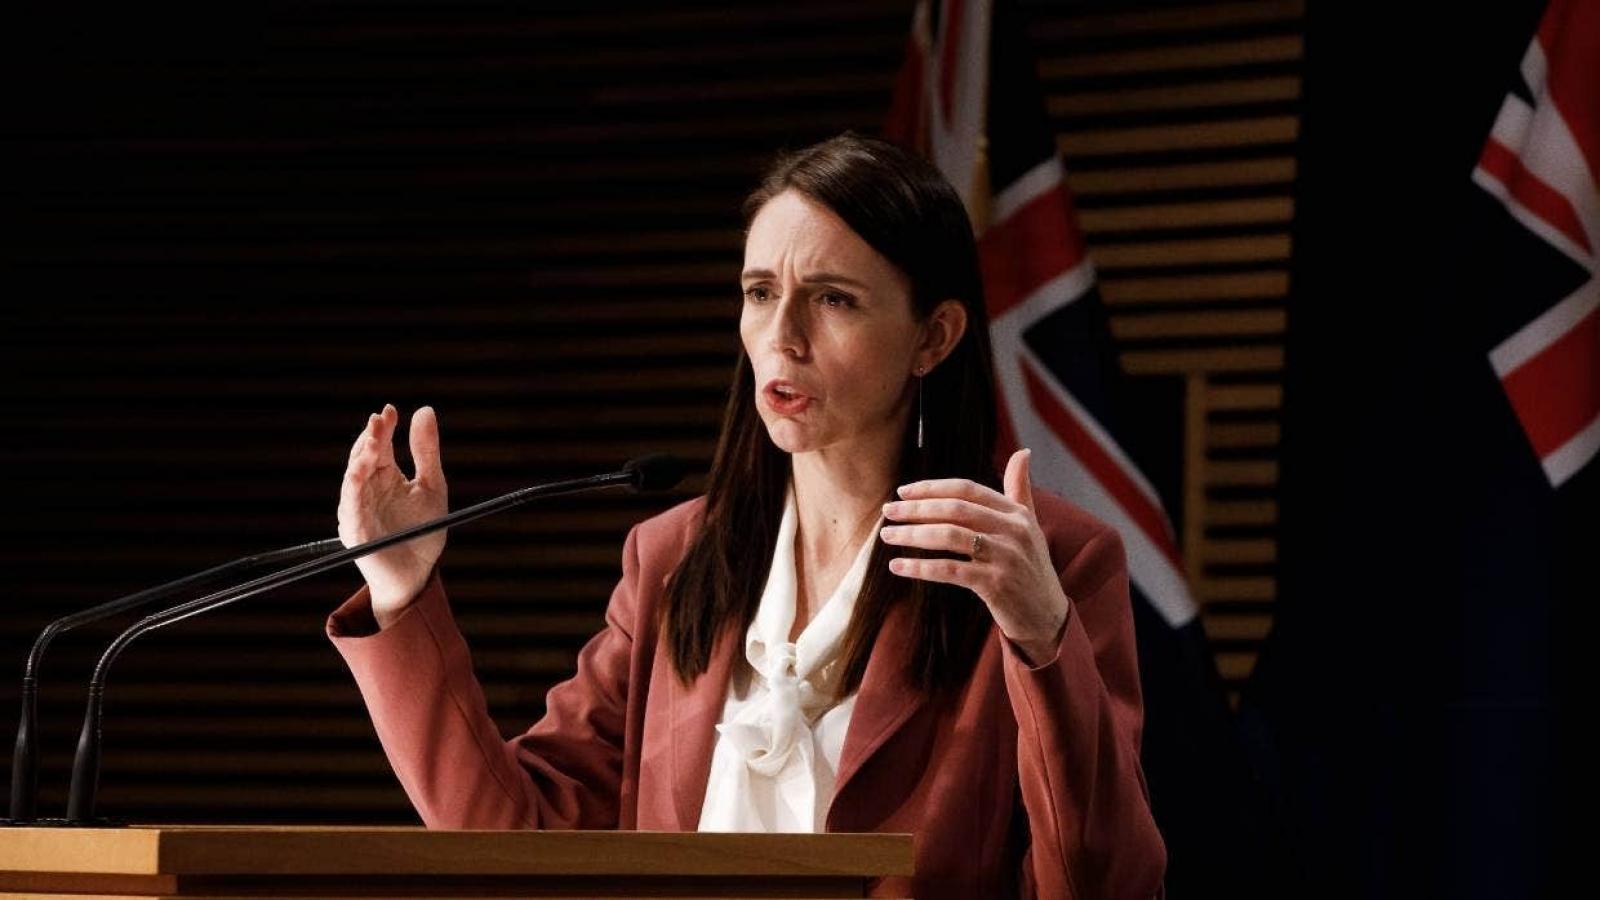 New Zealand mua lại 500.000 liều vaccine Covid-19 từ Đan Mạch